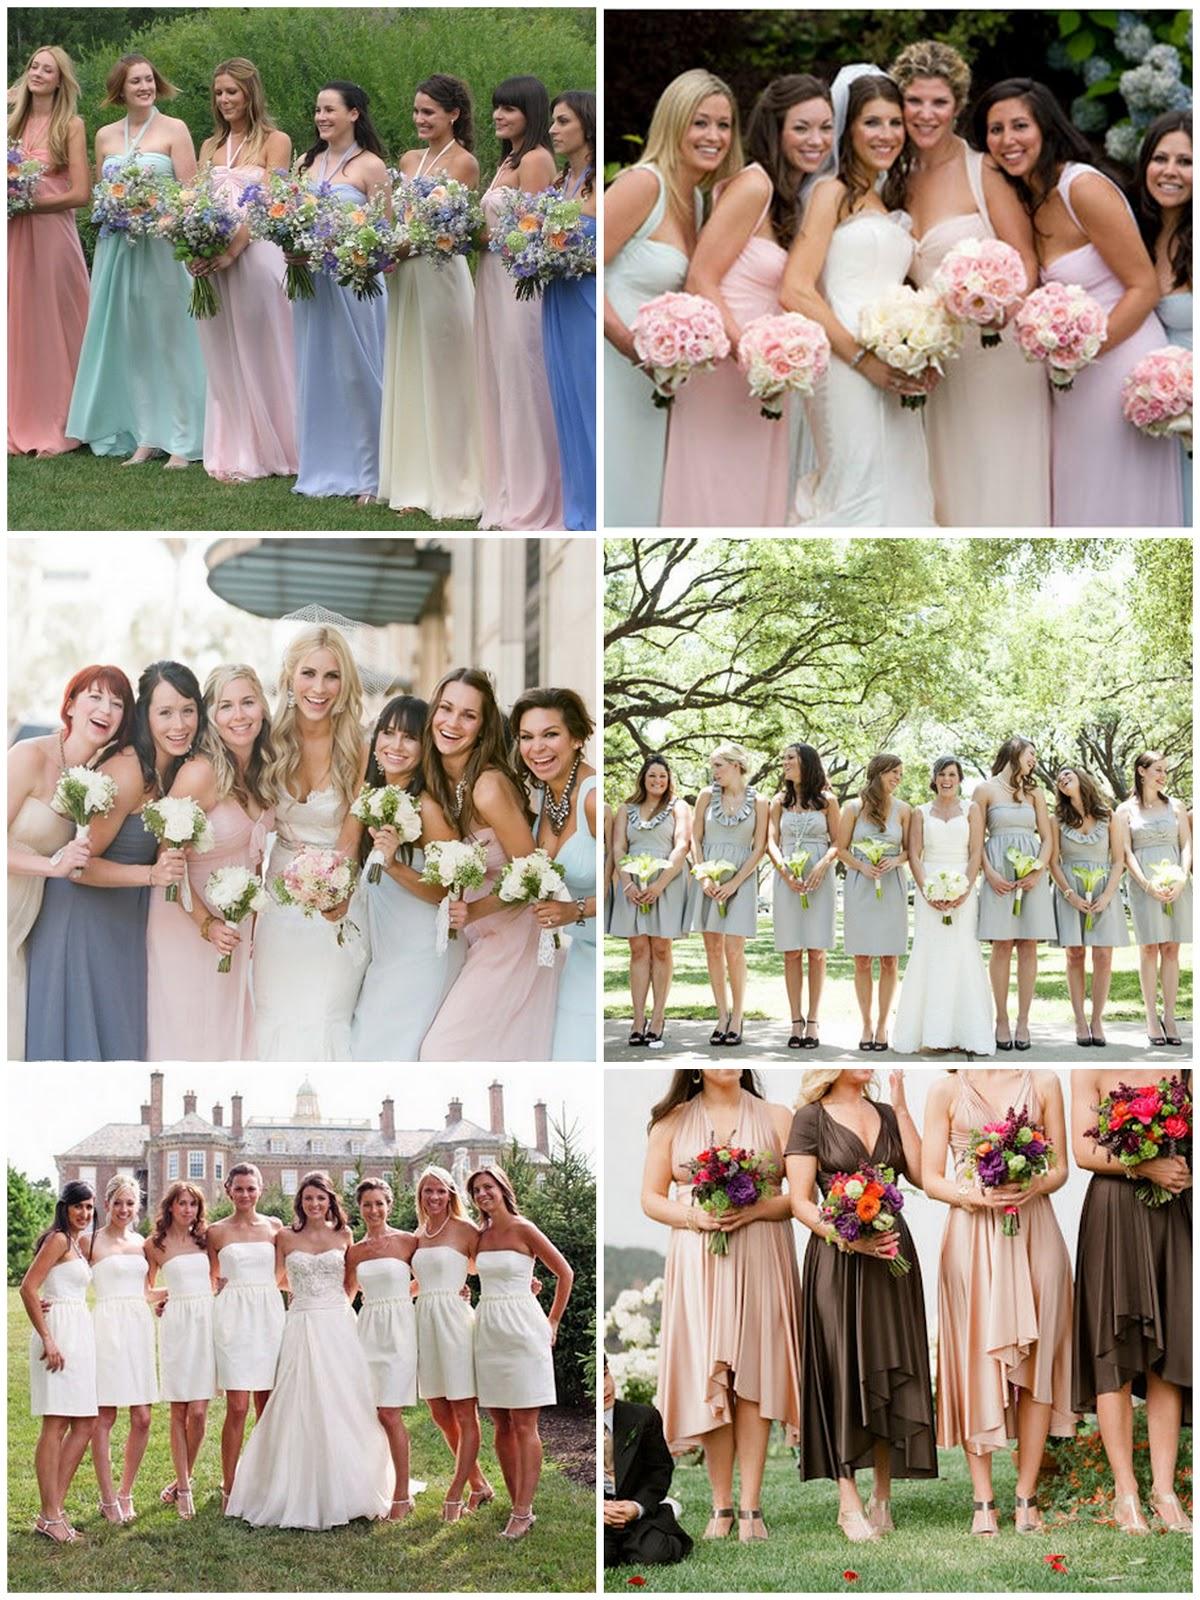 Matrimonio...e un tocco di classe: Consejos Para Escoger el Vestido ...